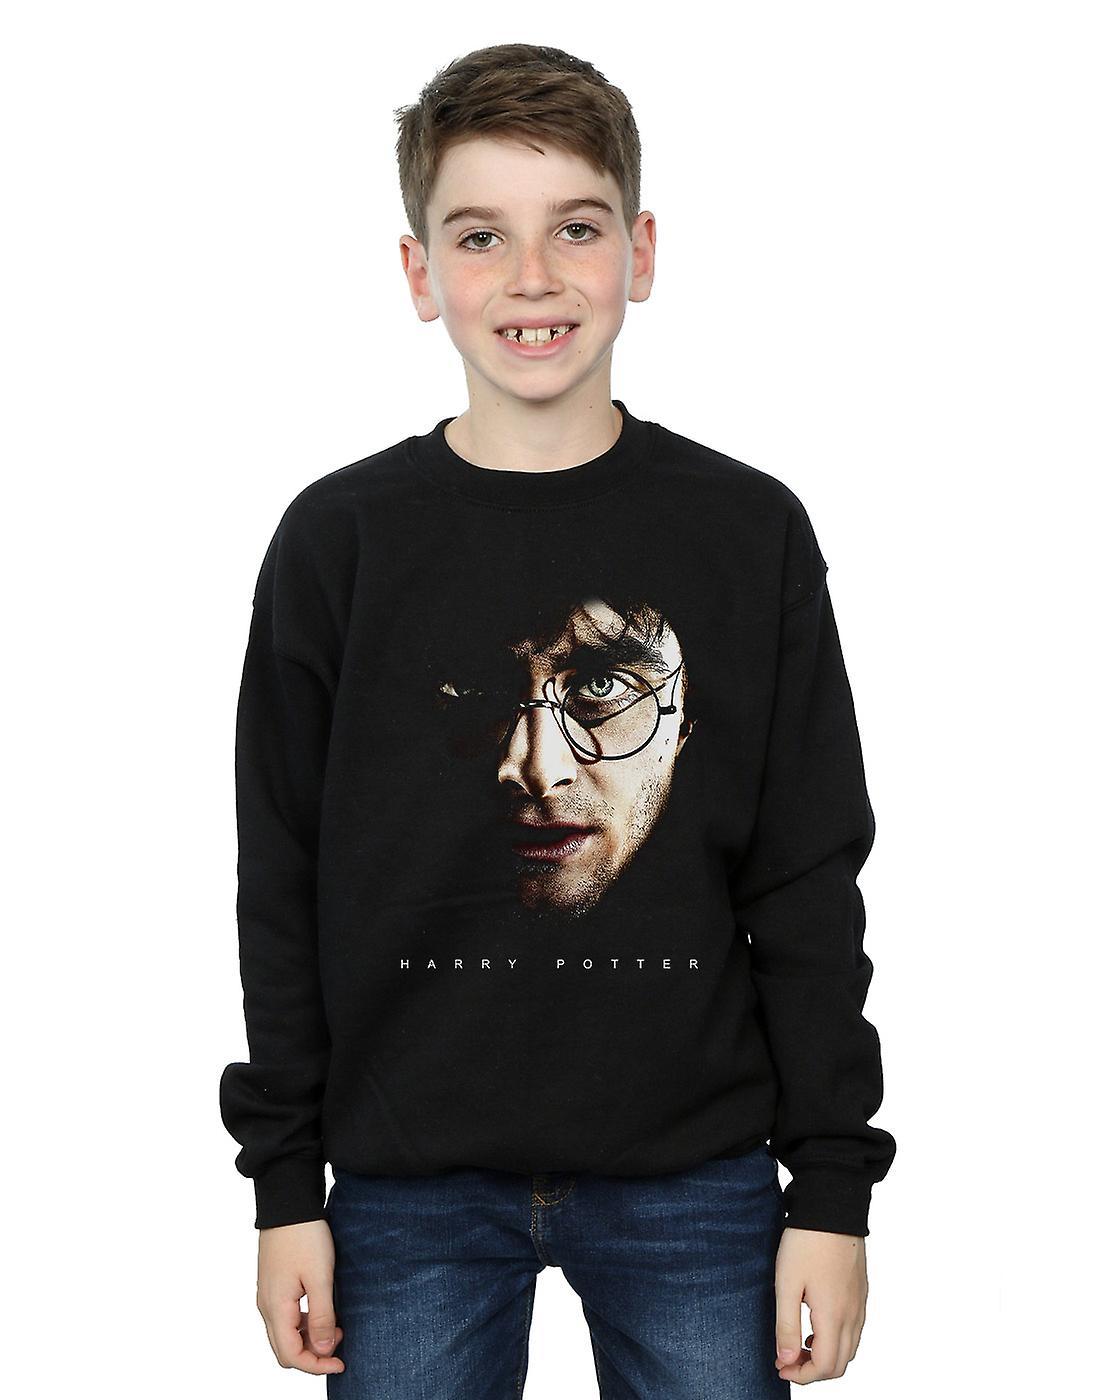 Harry Potter Boys Dark Portrait Sweatshirt